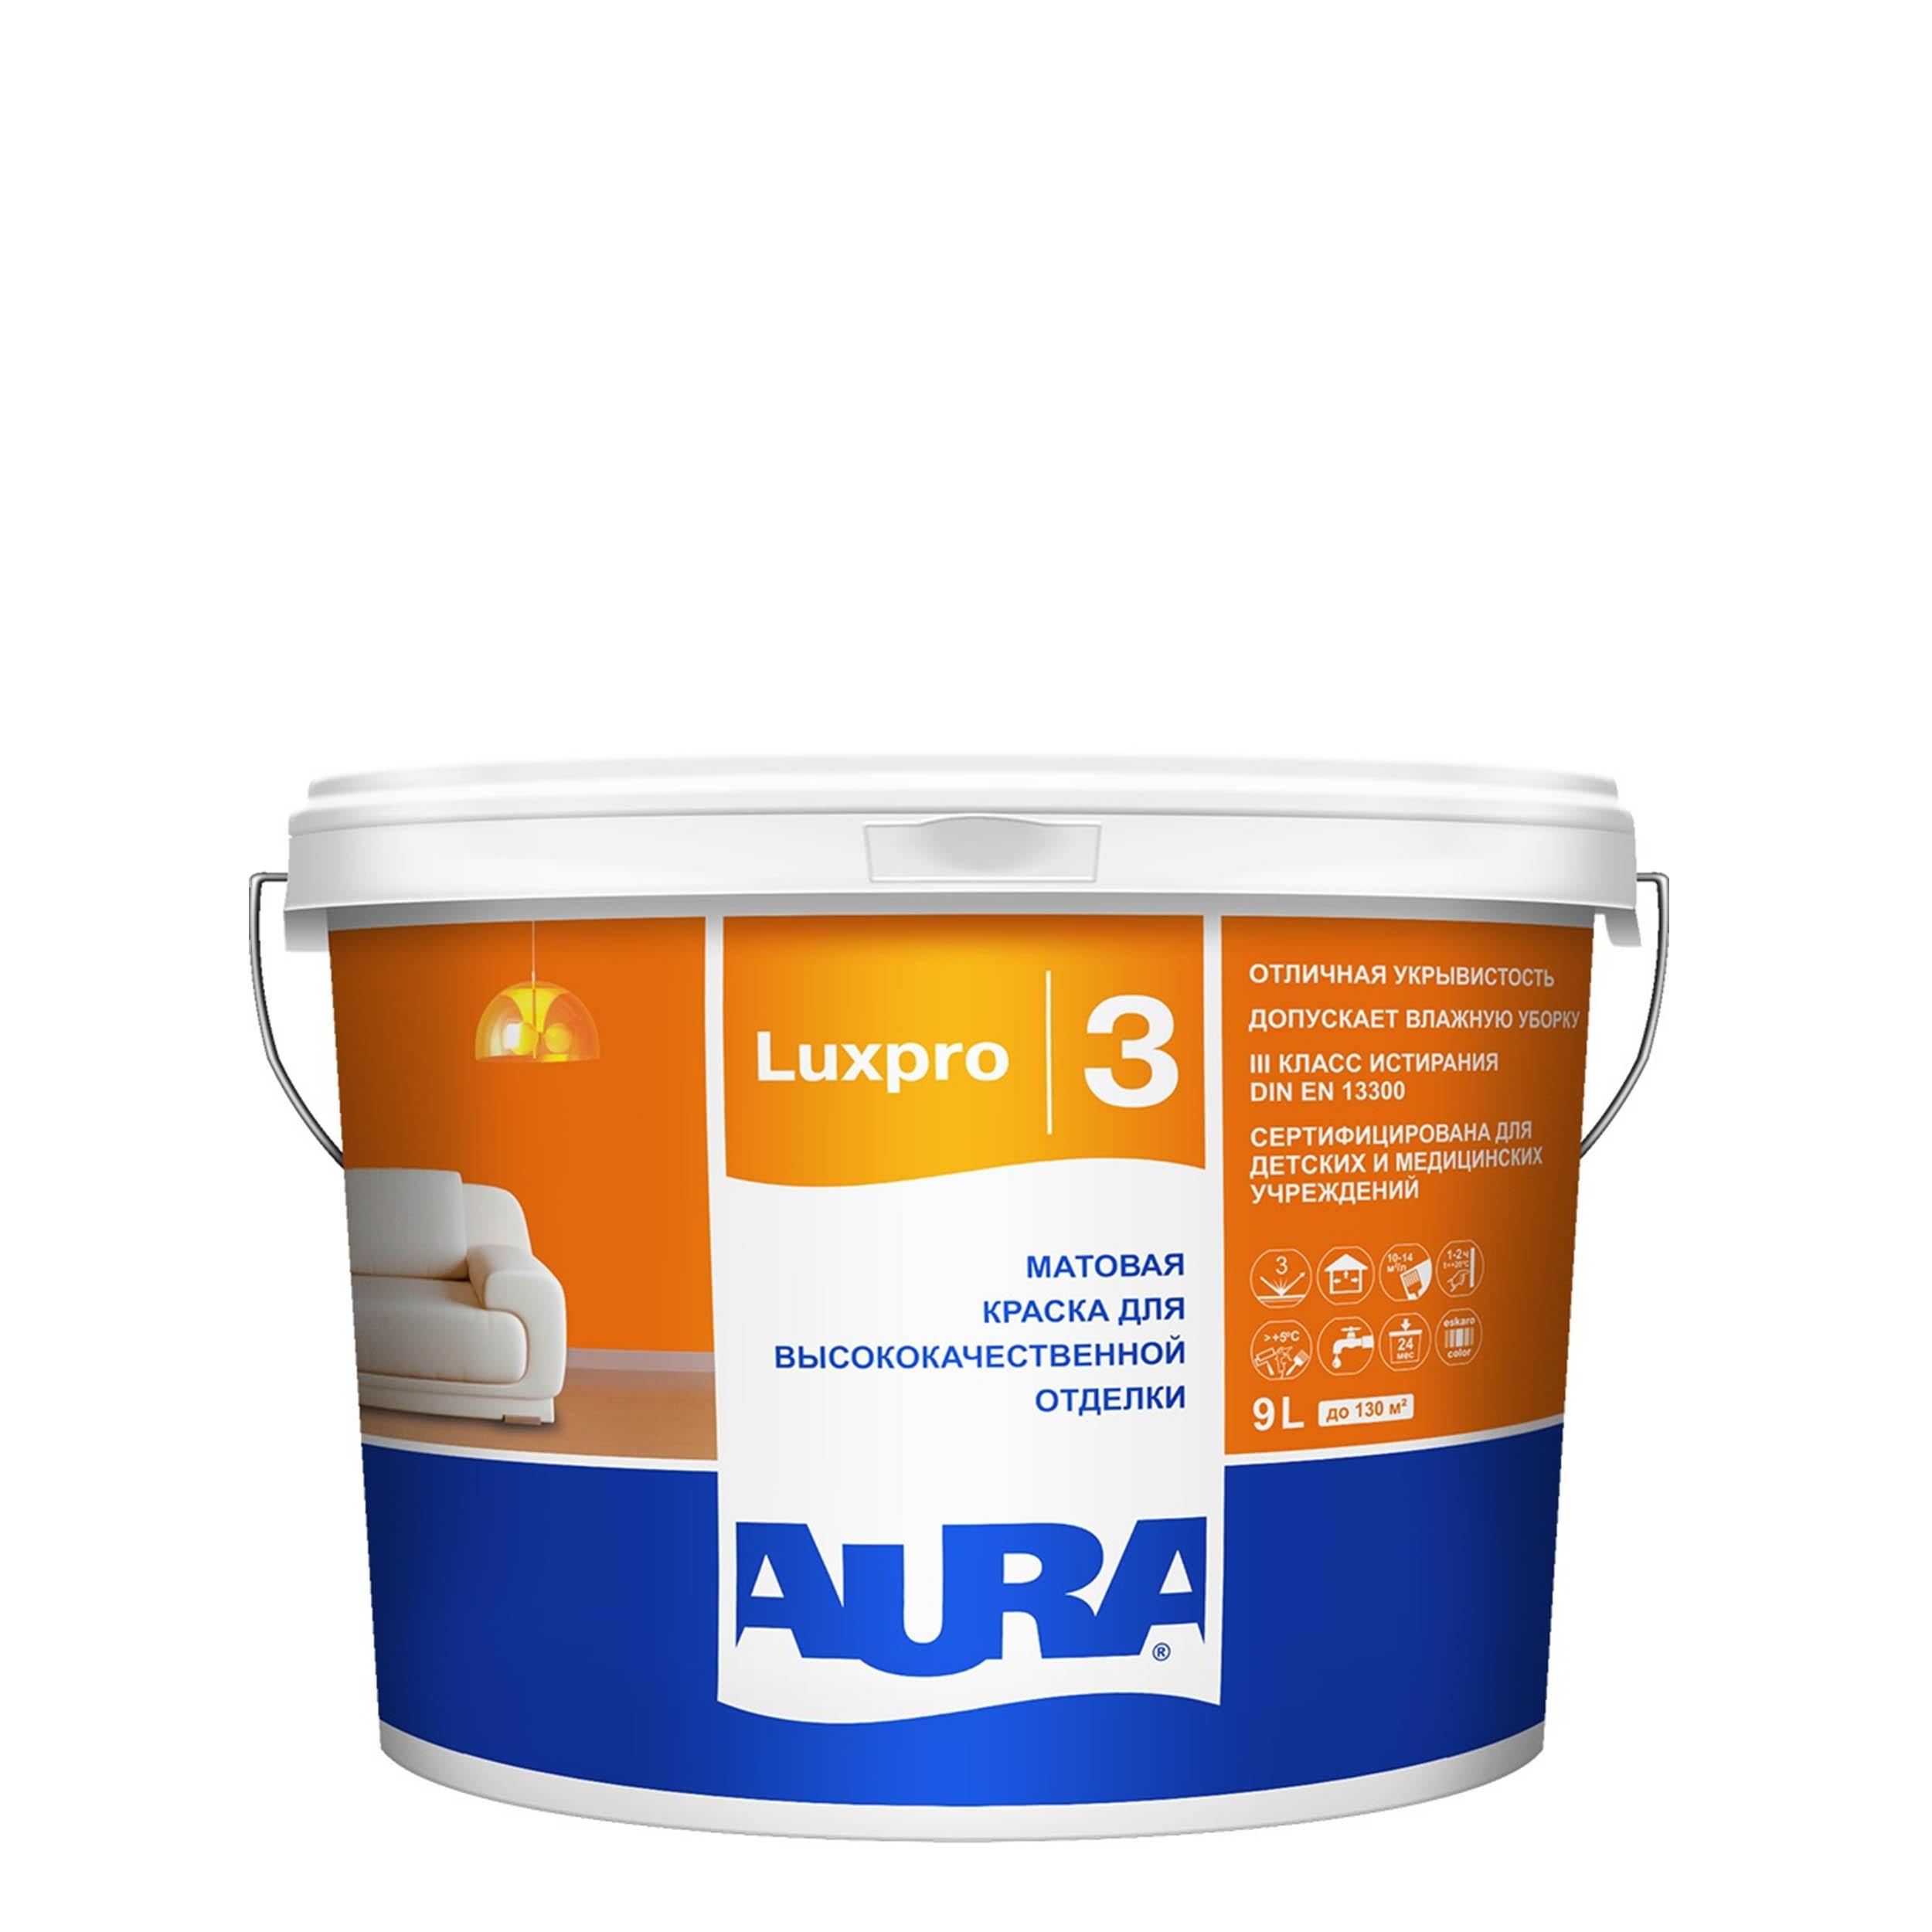 Фото 4 - Краска интерьерная, Aura LuxPRO 3, RAL 2004, 11 кг.